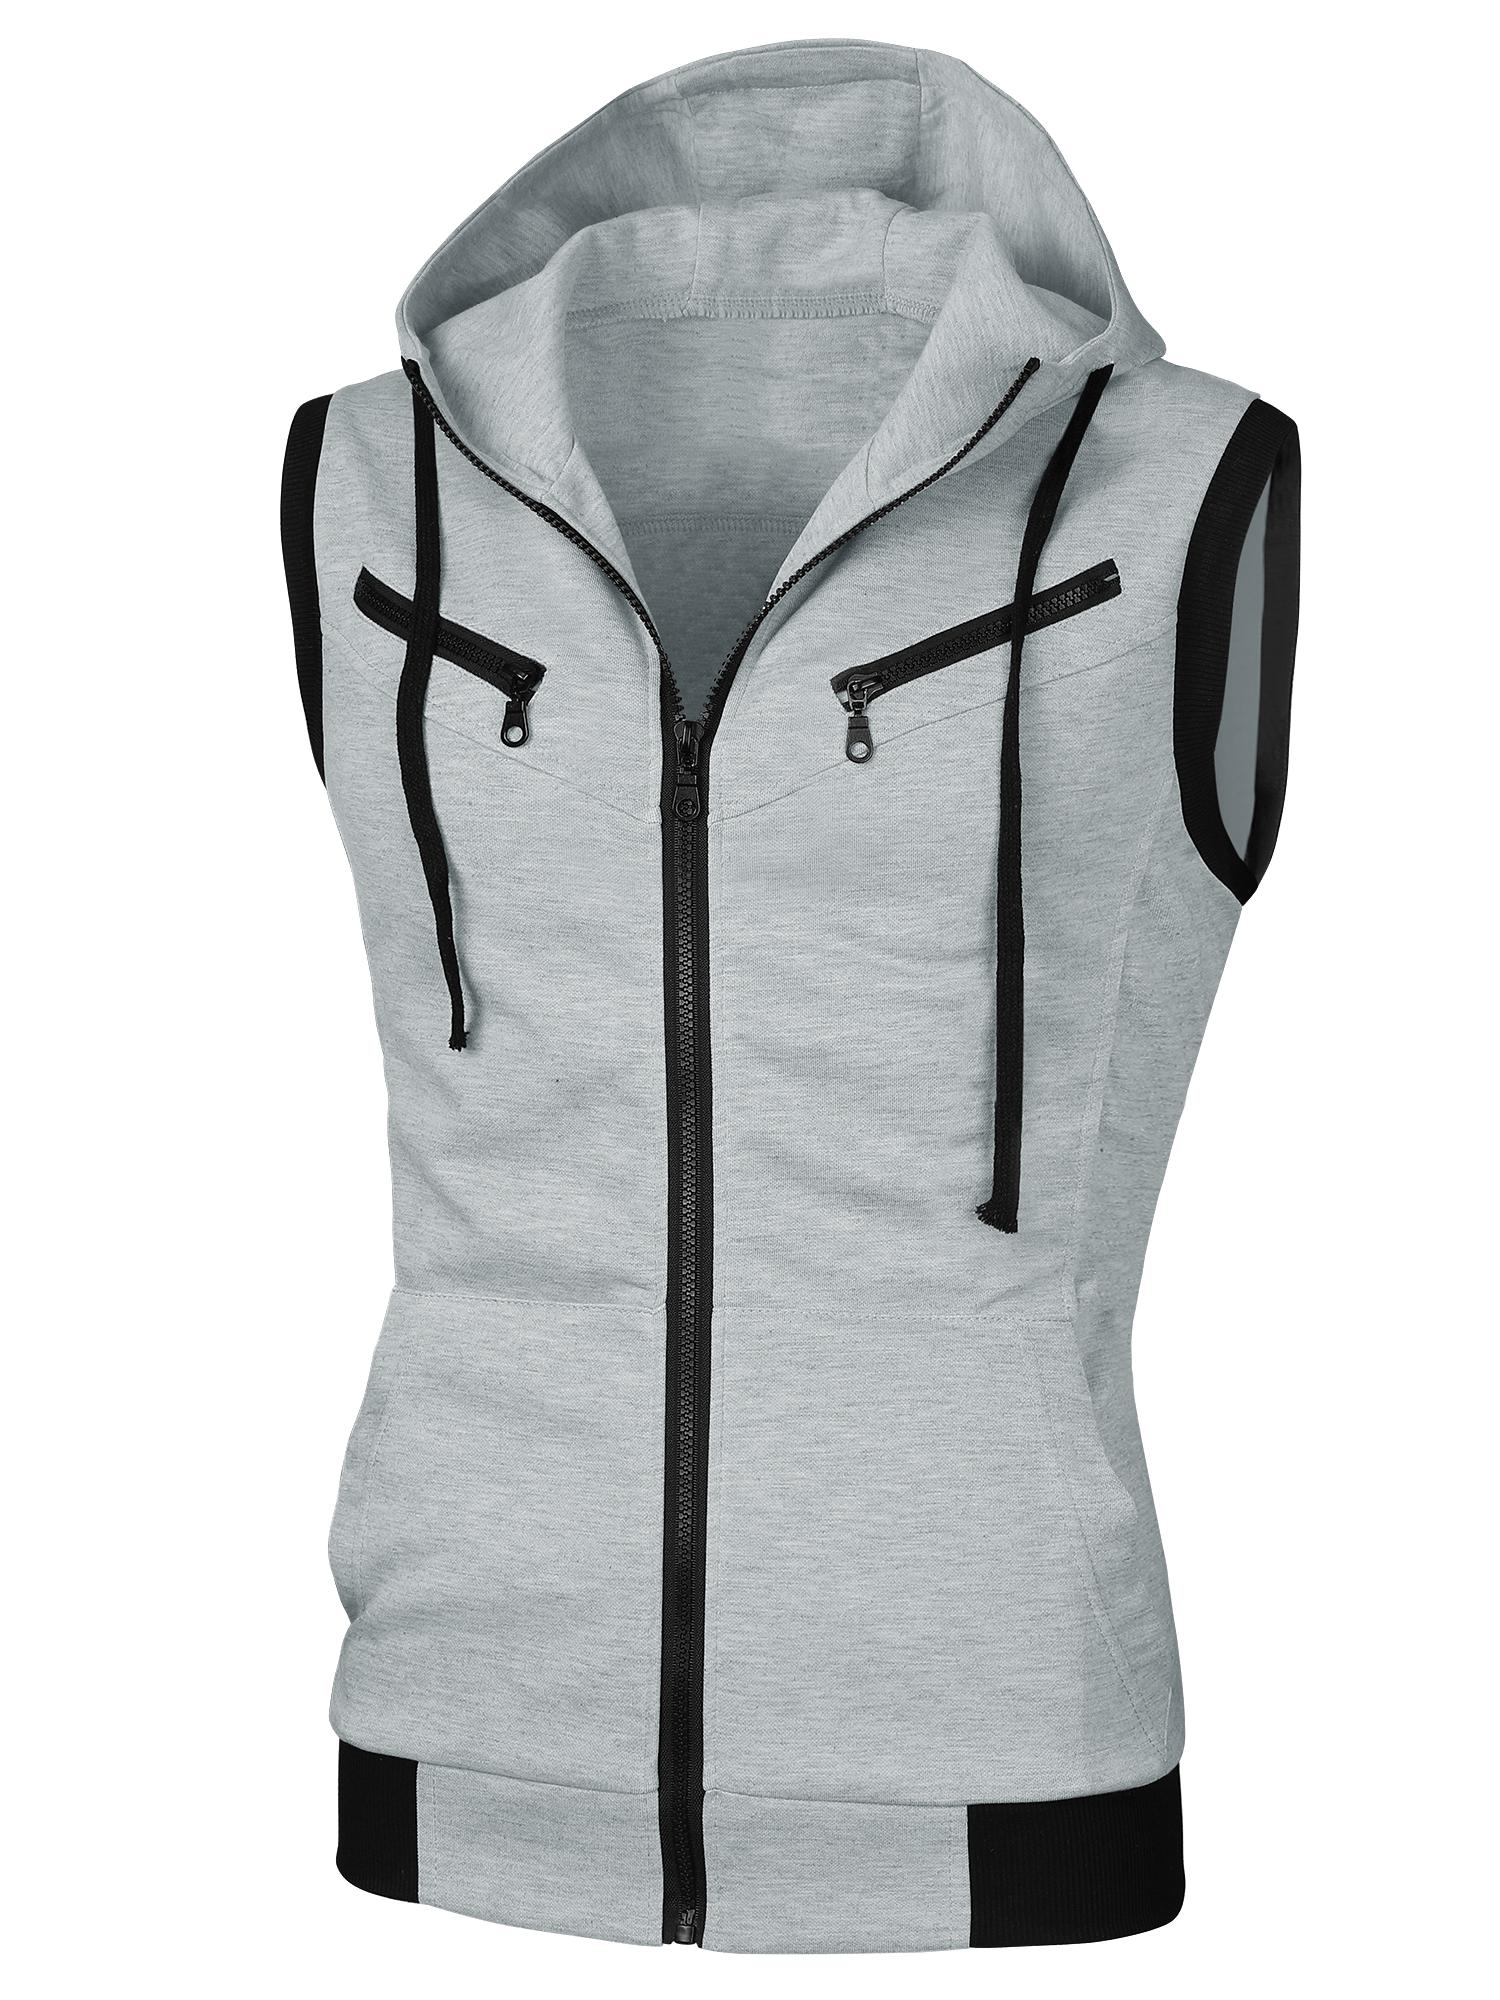 Men Sleeveless Kangaroo Pockets Fashion Hoodie Vest Heather Gray L